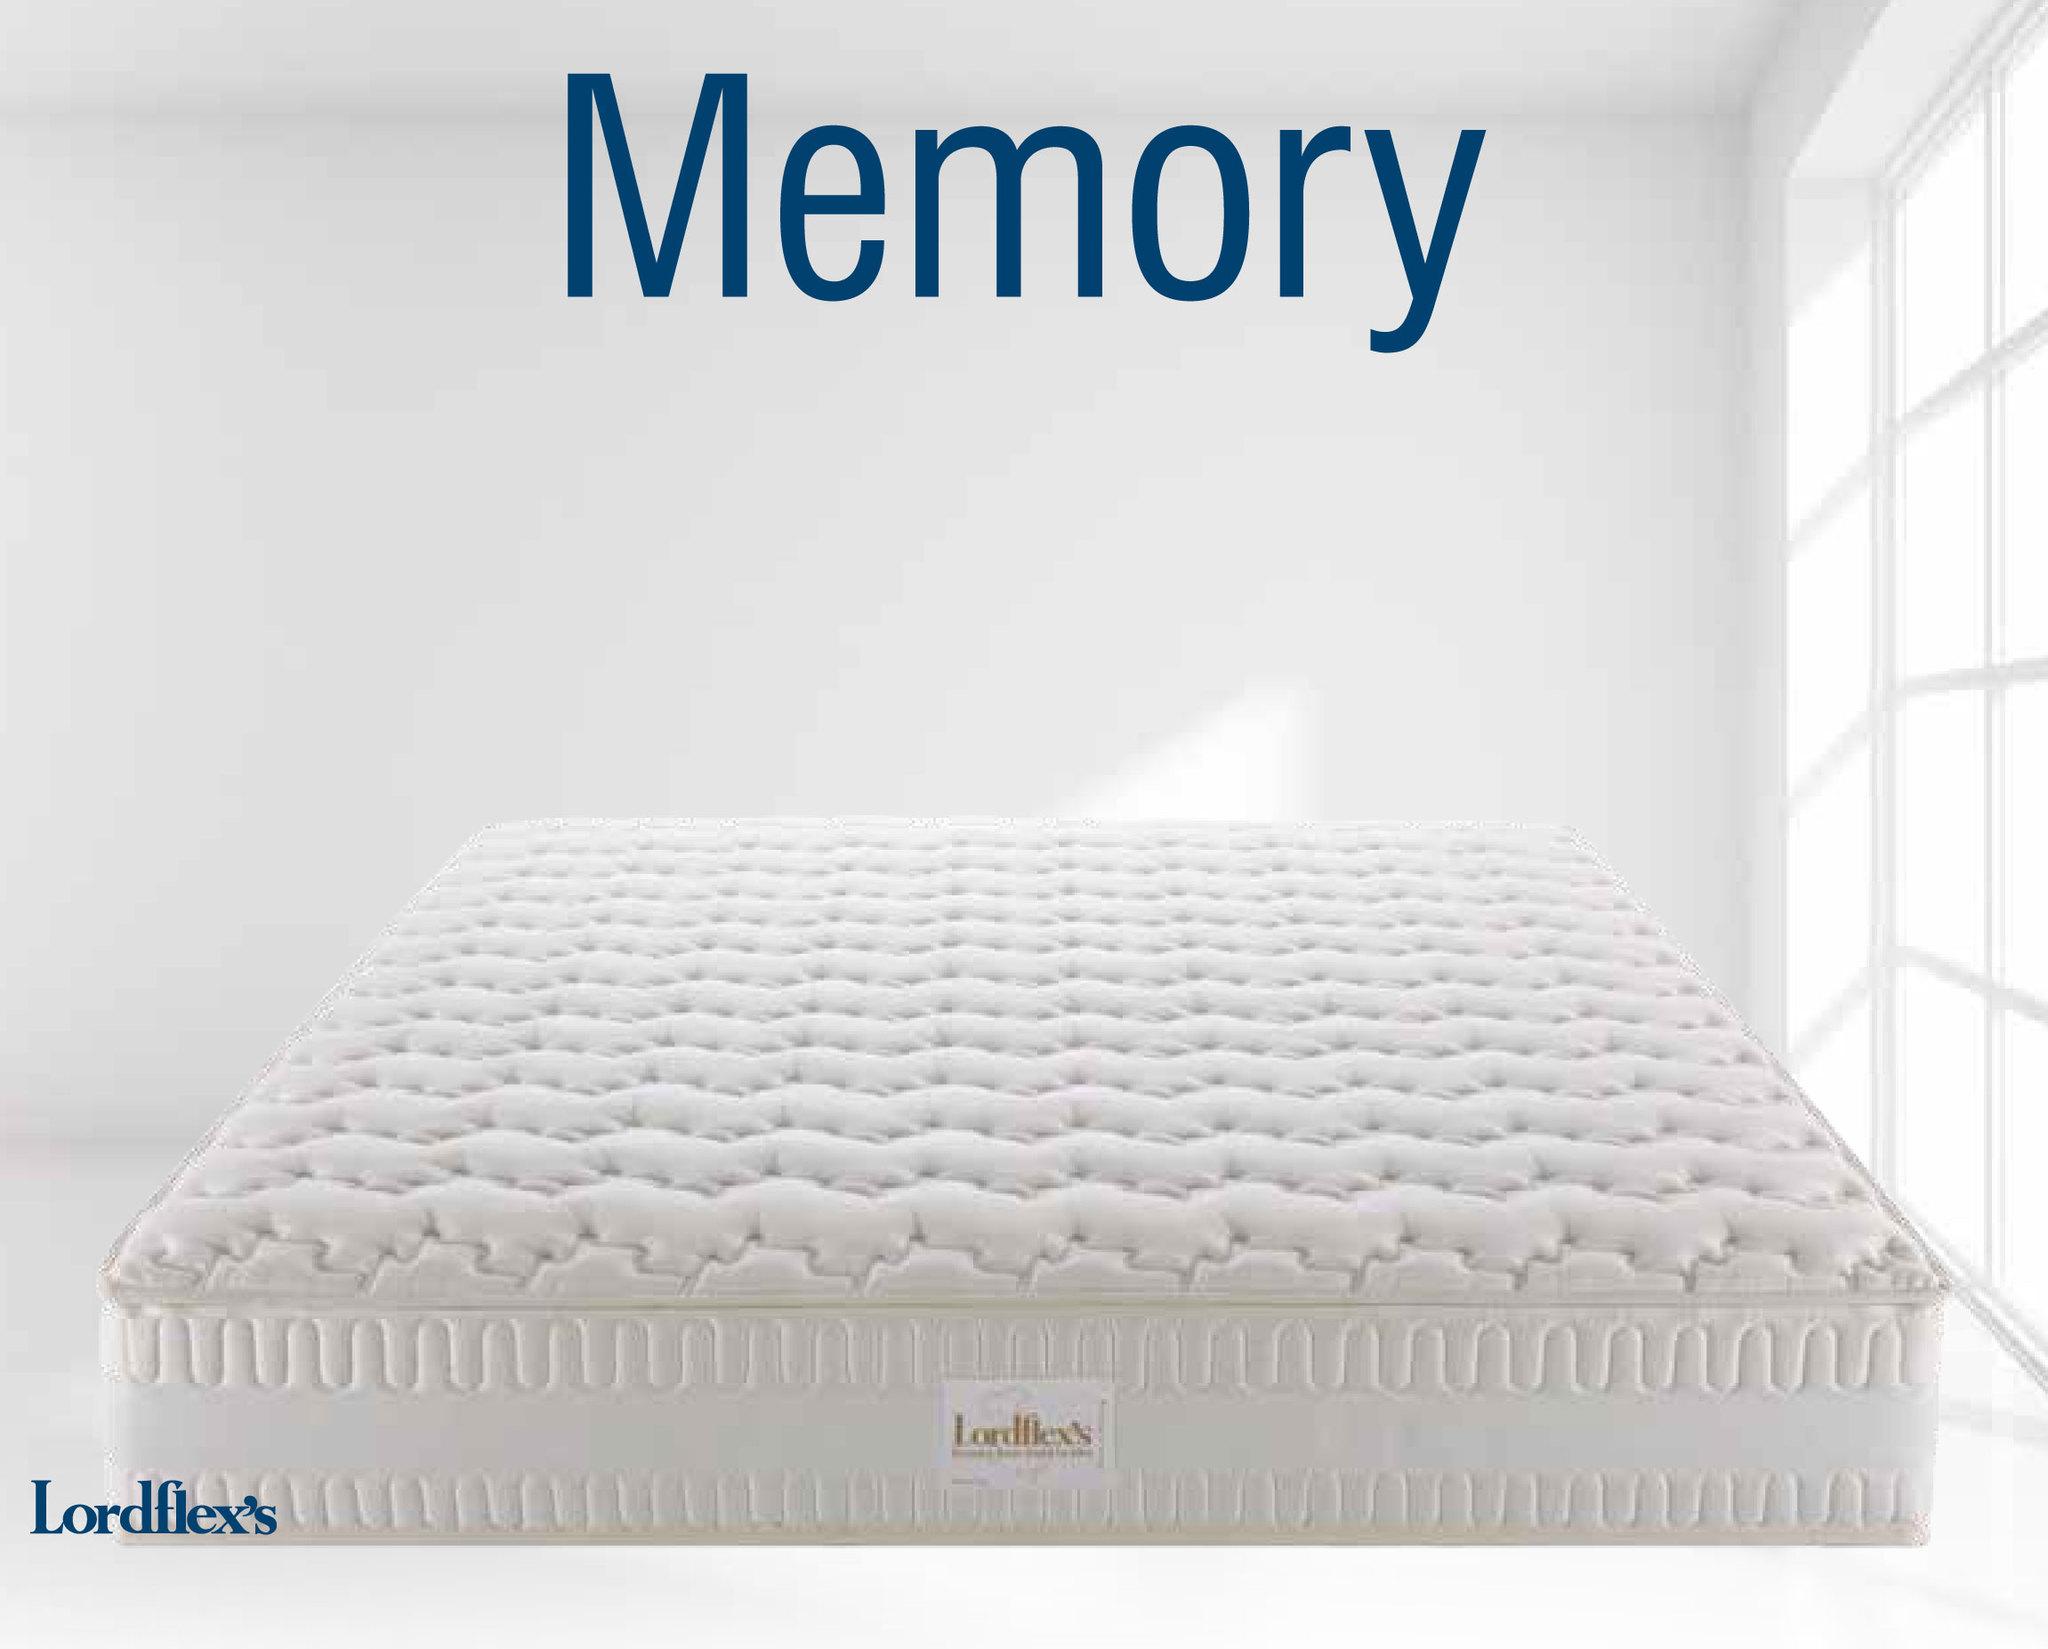 Матрасы Матрас ортопедический Lordflex's Memory 90х200 до 140 кг Memory.jpg